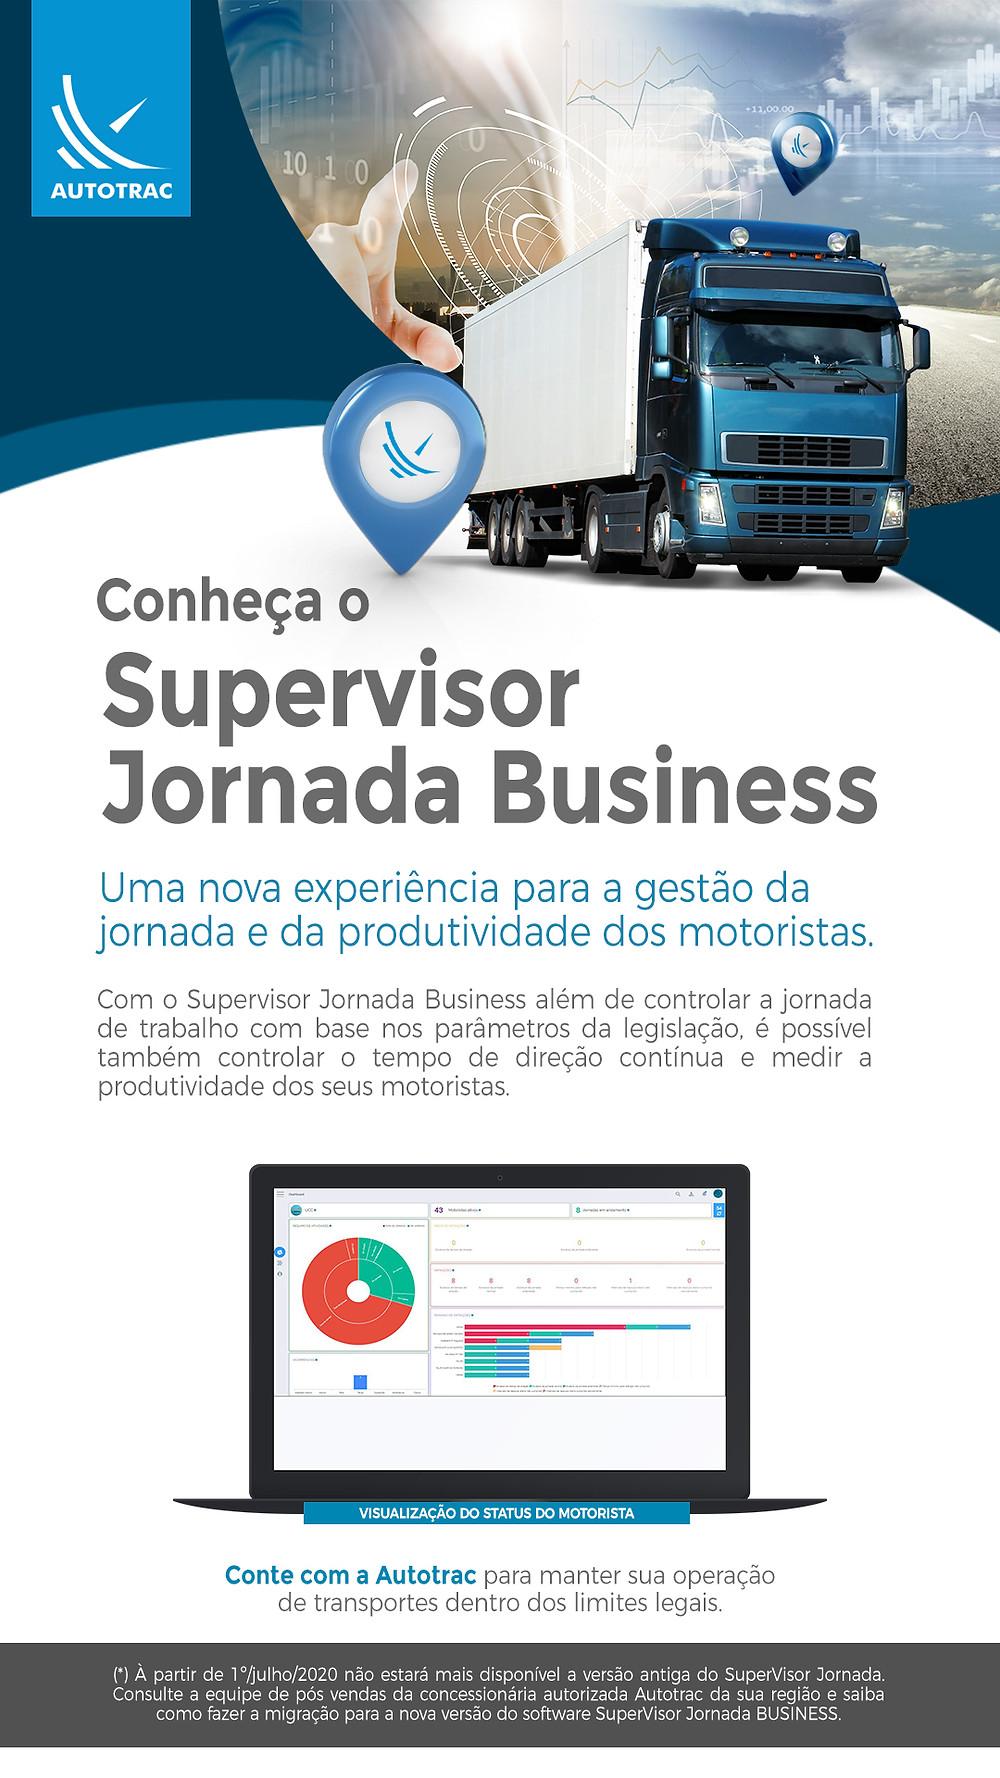 Autotrac Supervisor Jornada Business